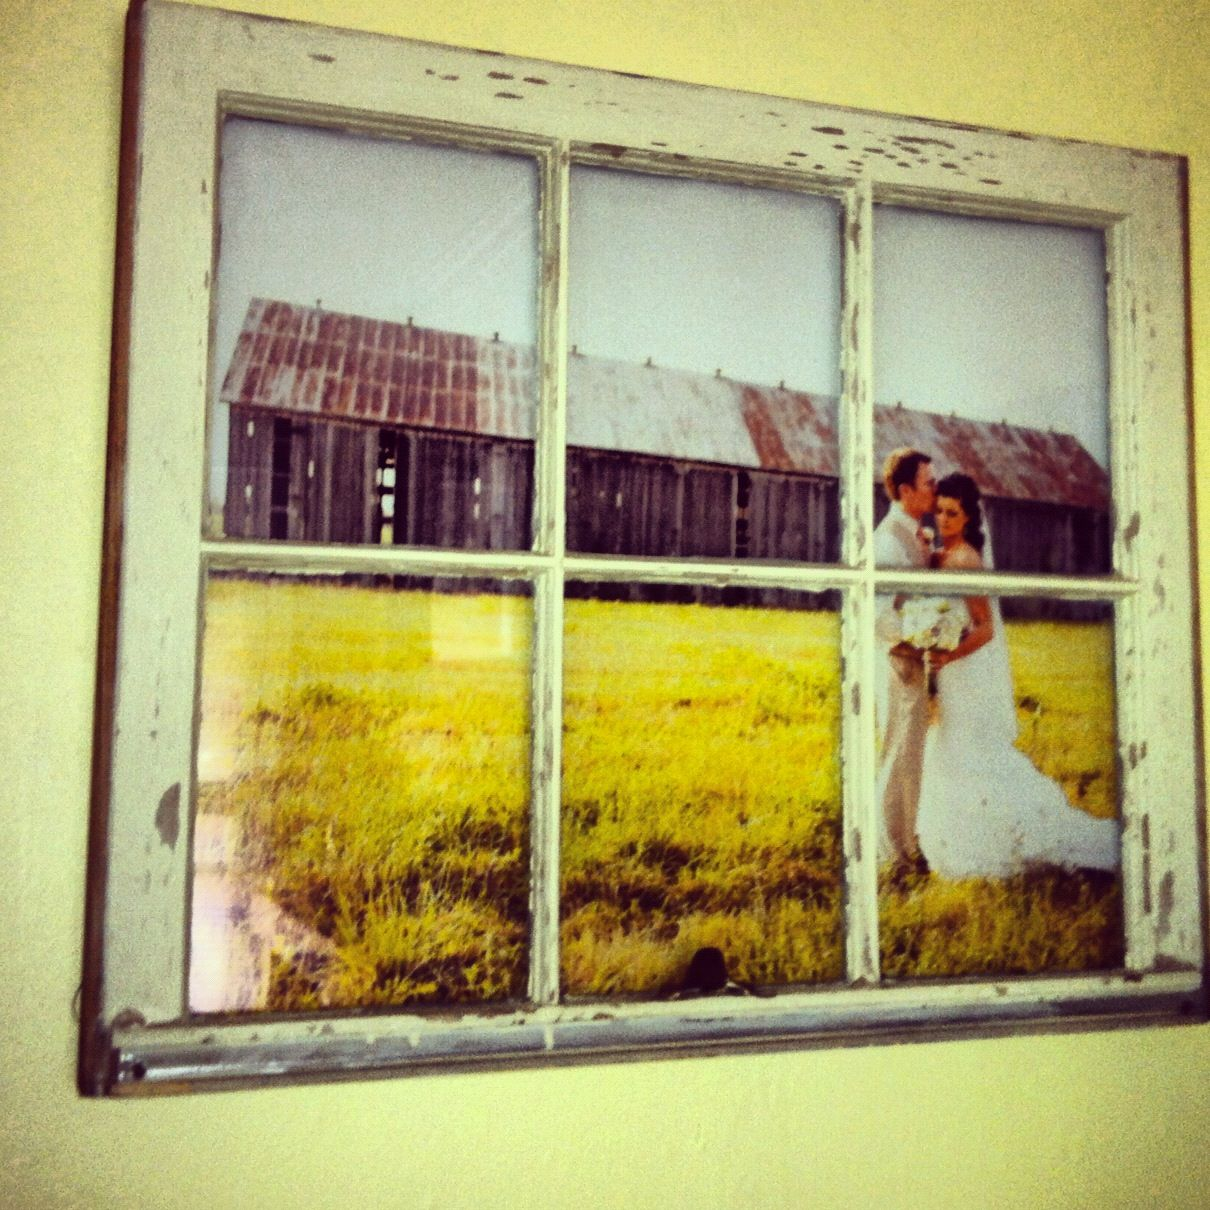 diy vintage window pane picture frame - Window Pane Frame